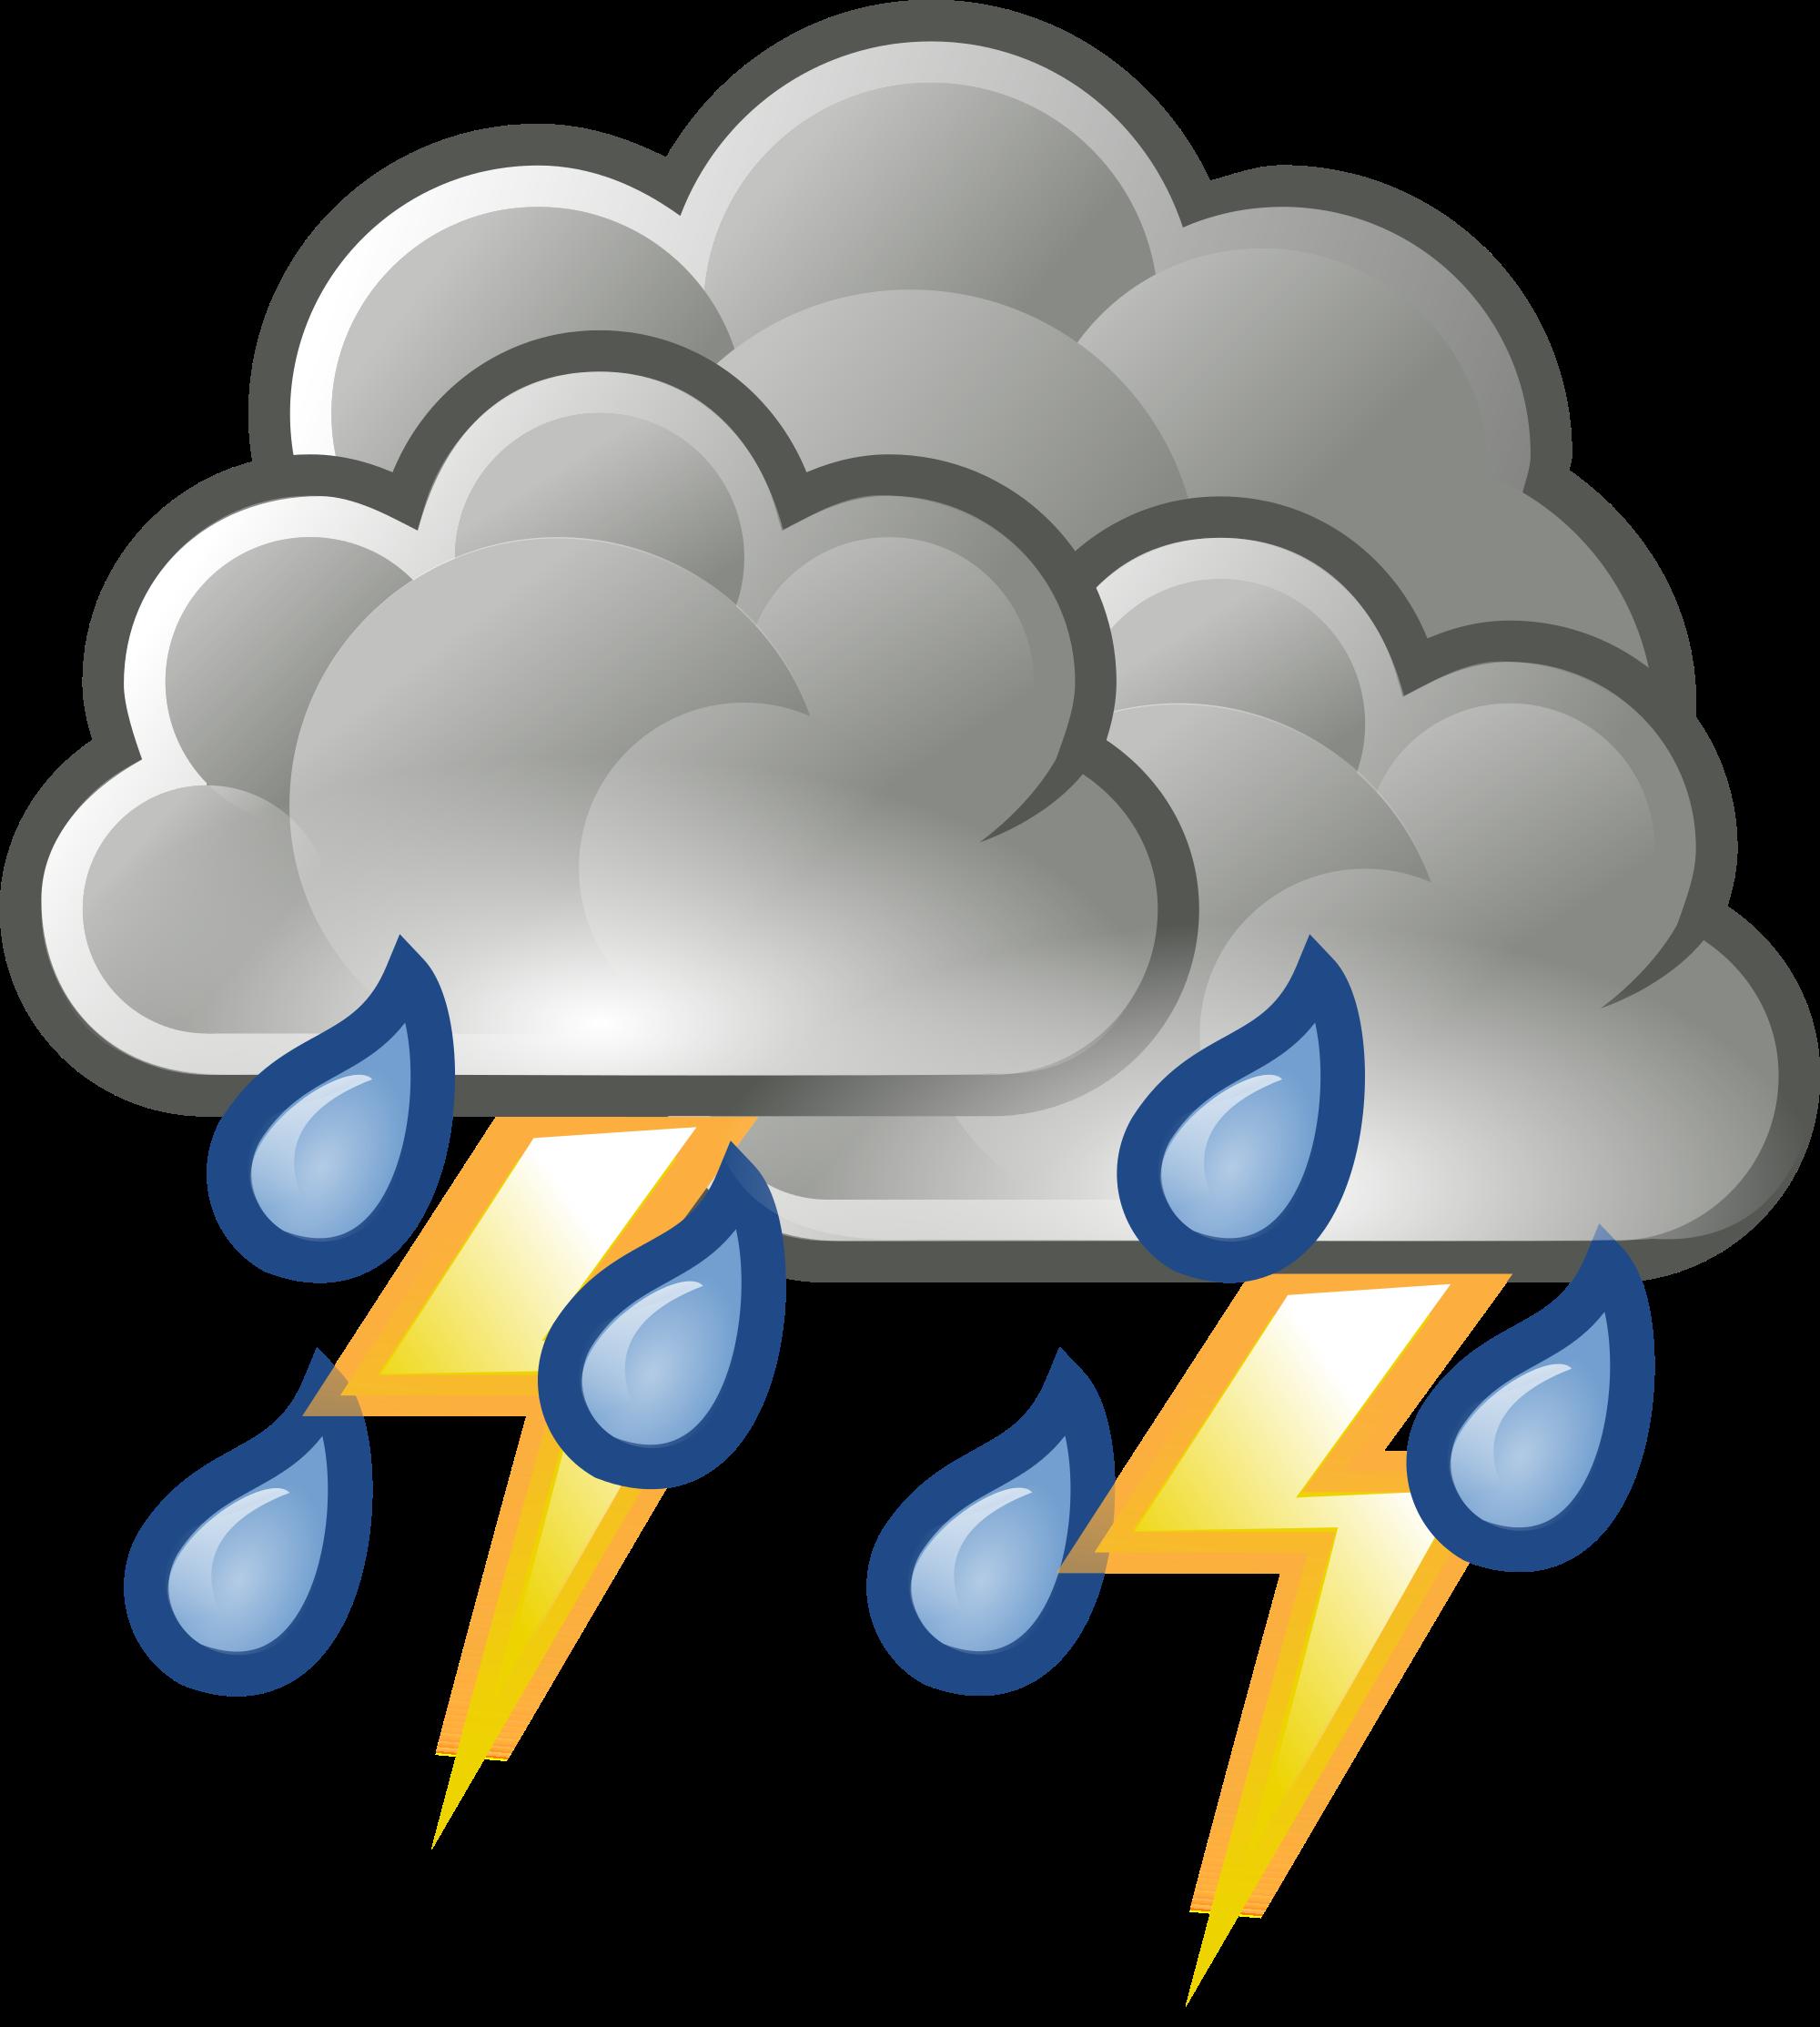 Thunderstorm Clipart. Clip Art. Ourcommunitymedia Free Clip Art Images.